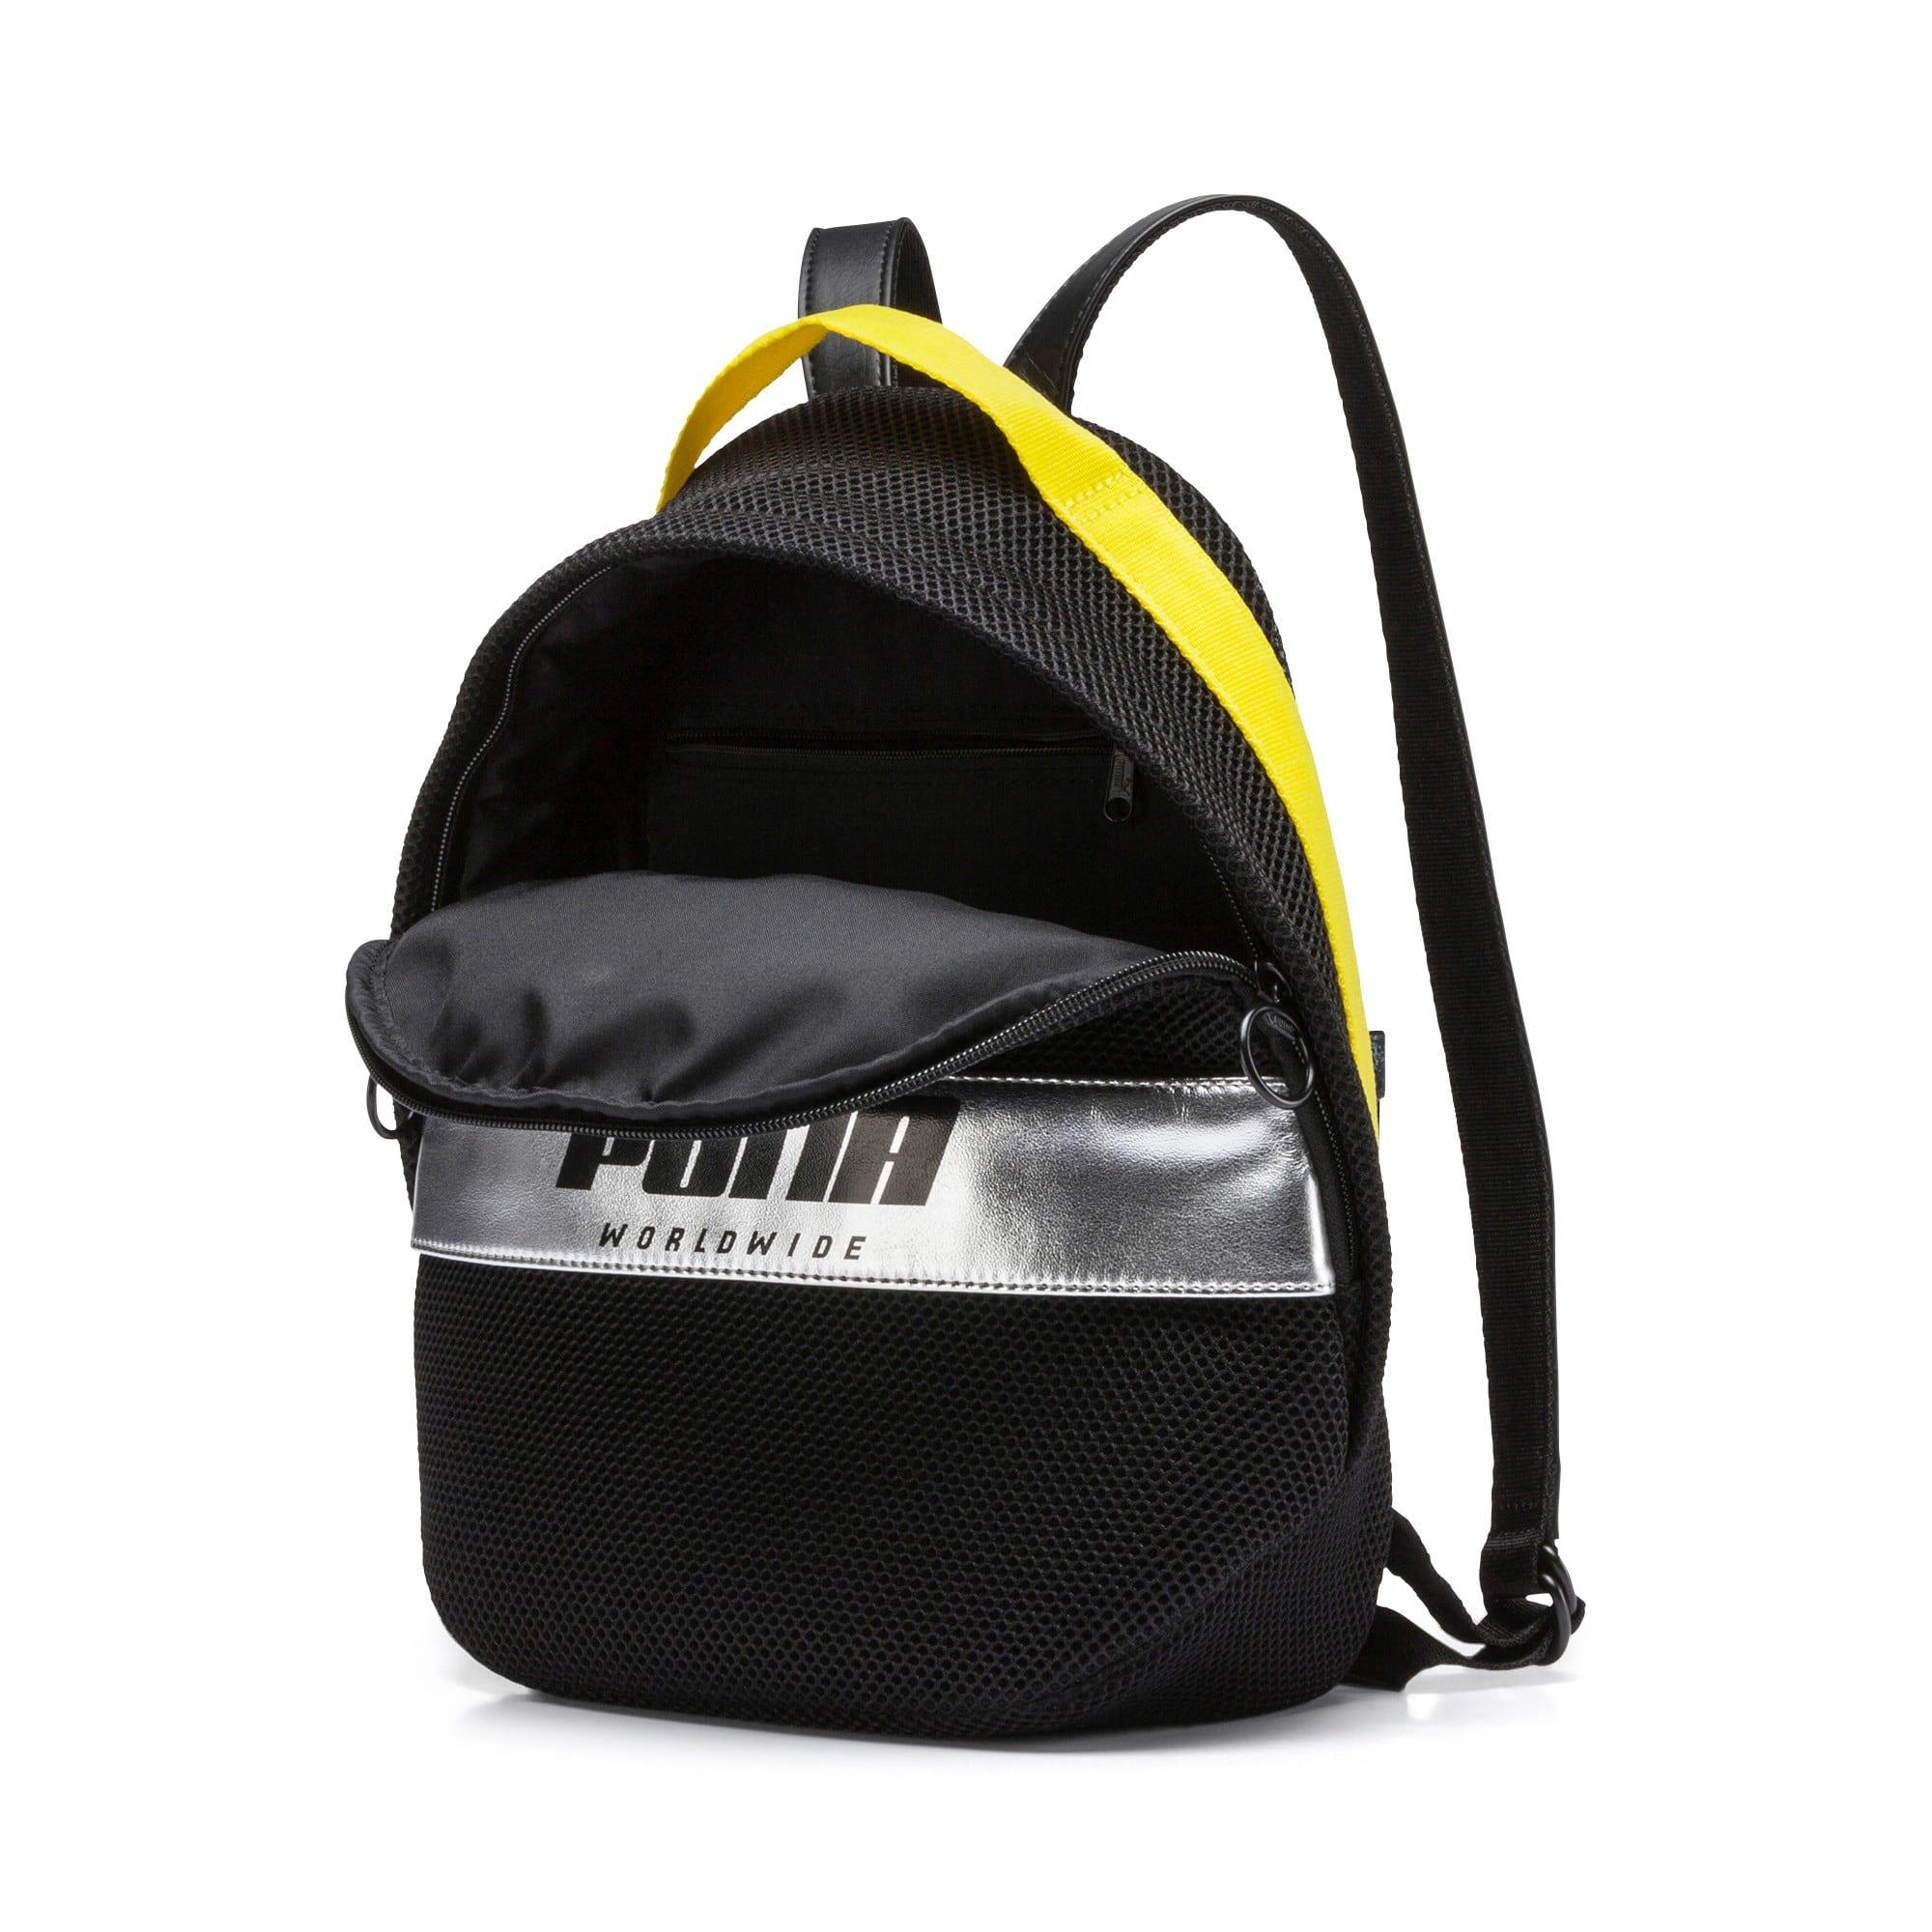 Thumbnail 4 of Women's Street Backpack, Puma Black-Blazing Yellow, medium